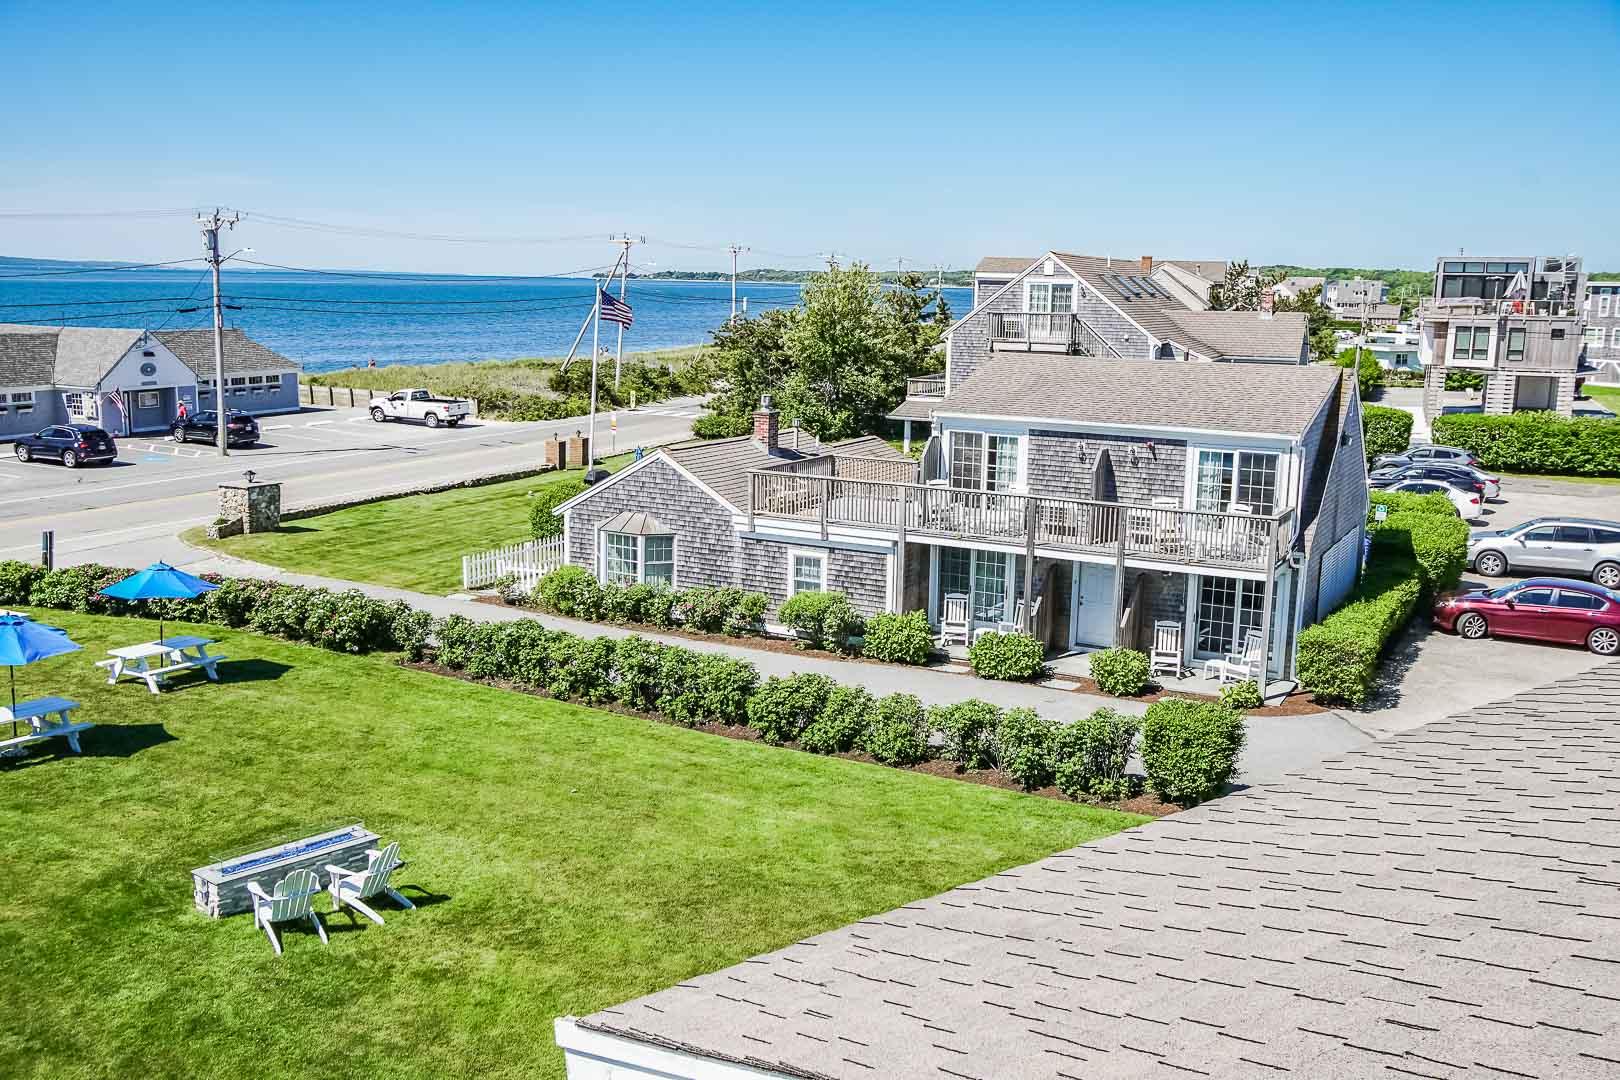 A calming view from VRI's Beachside Village Resort in Massachusetts.